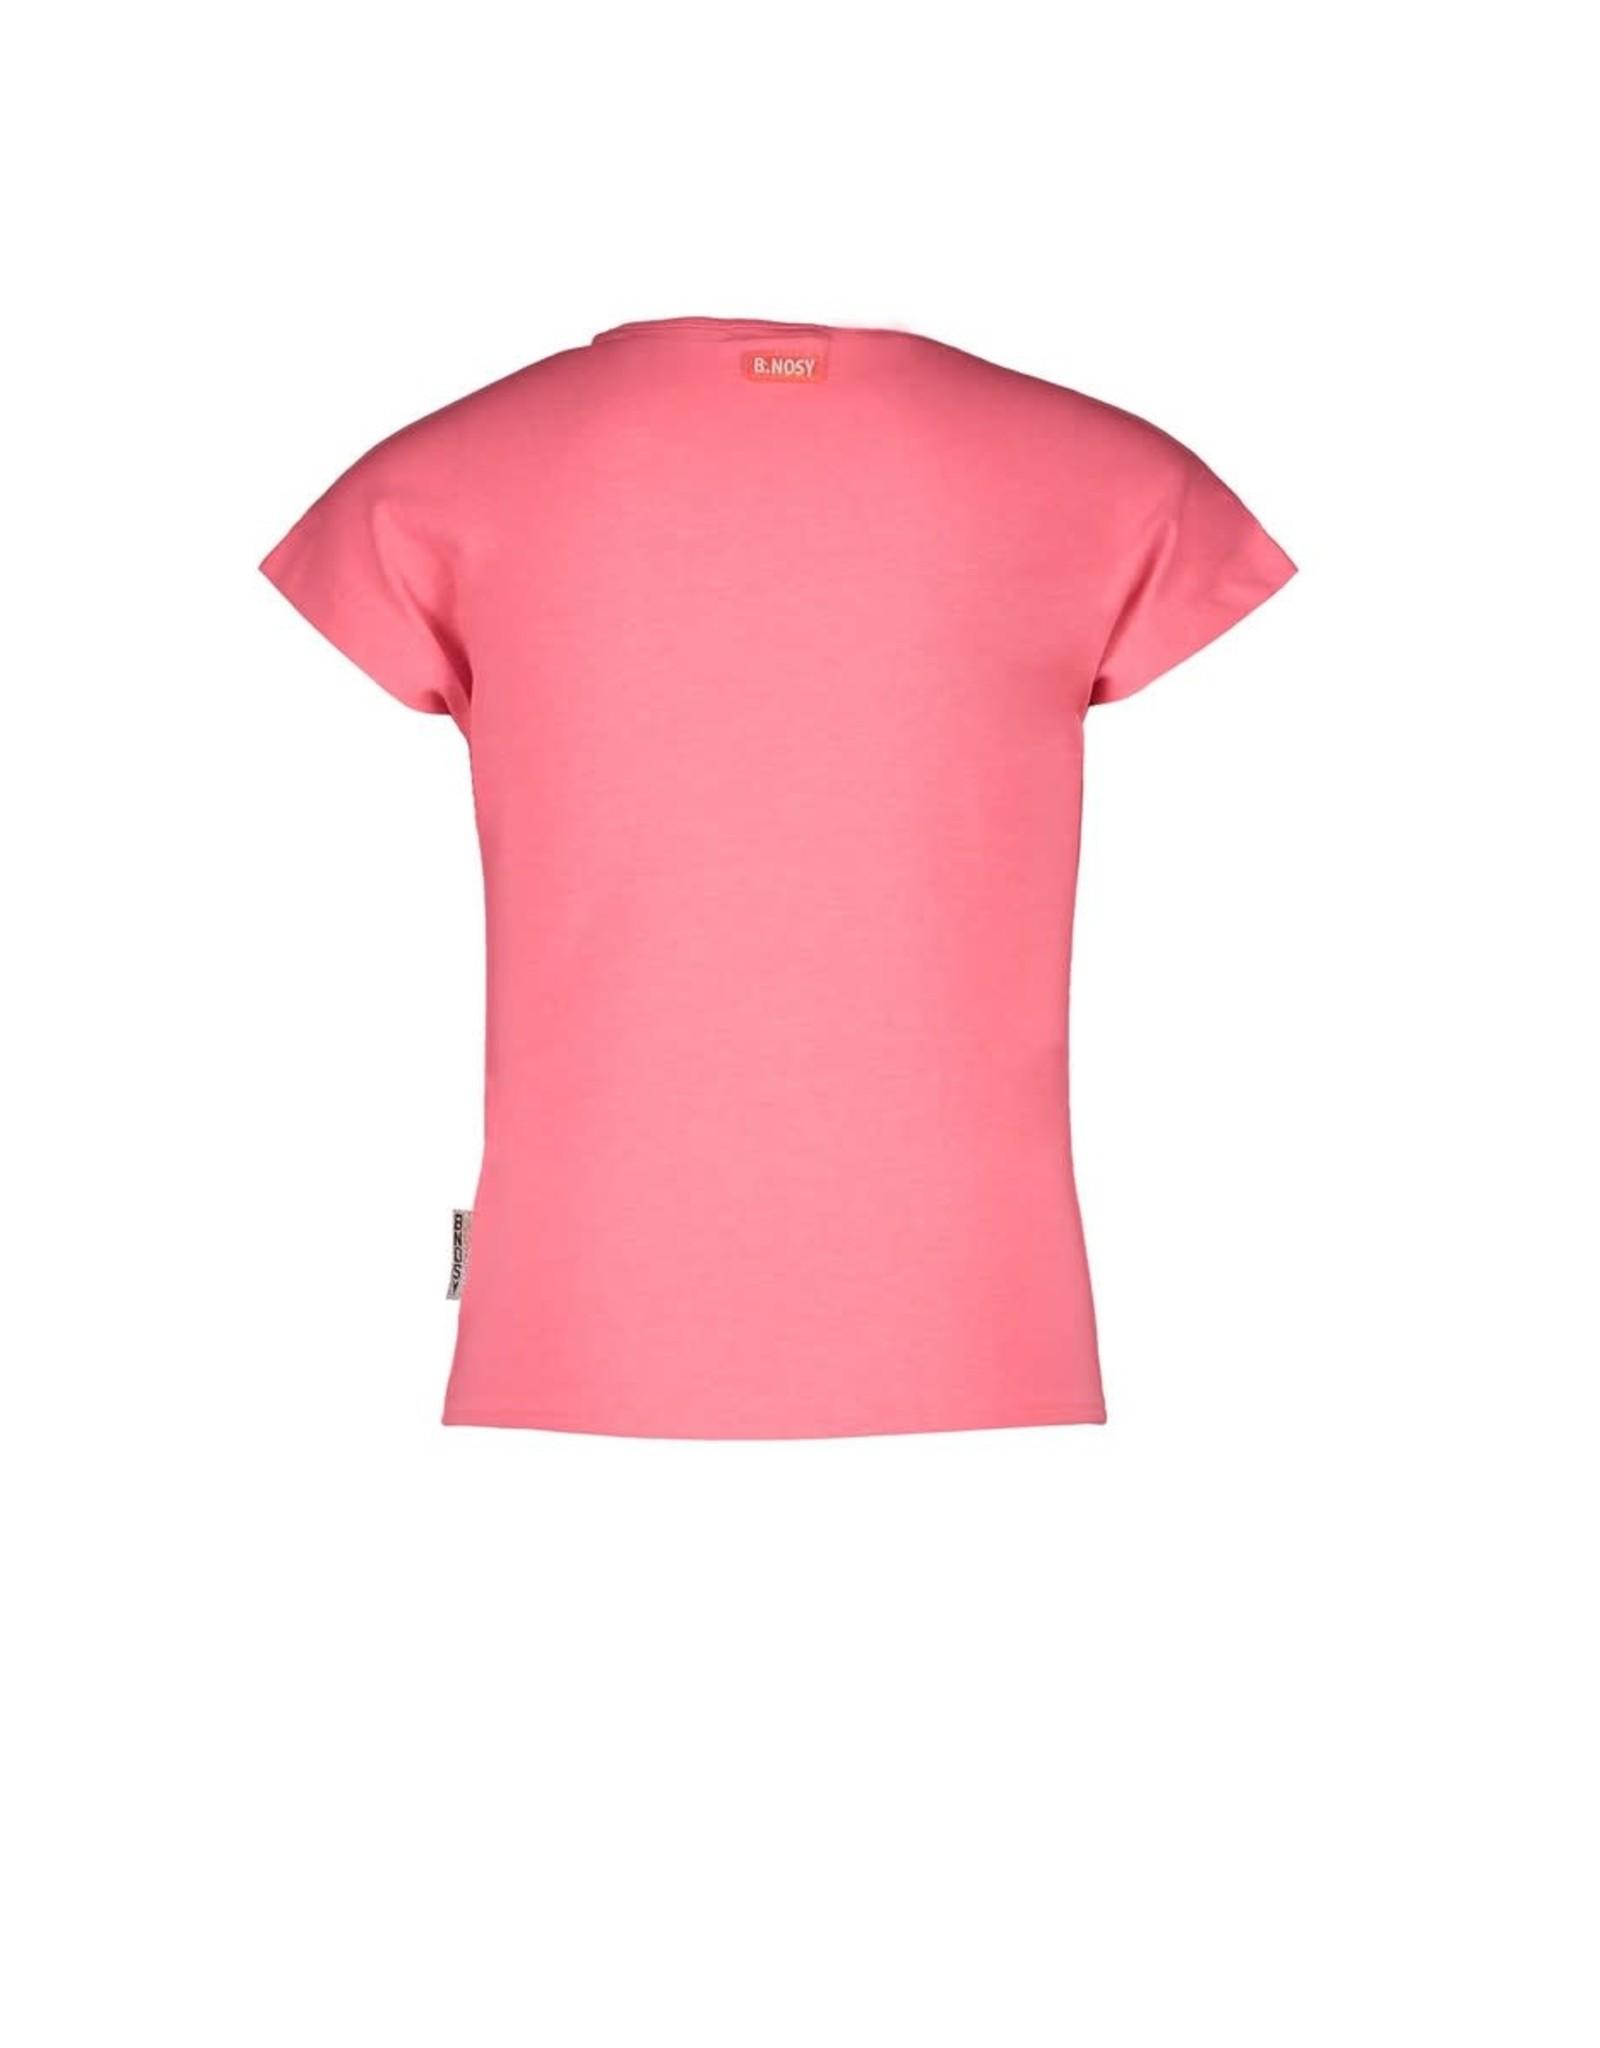 B.Nosy B.Nosy meisjes t-shirt met knoop Festival Pink